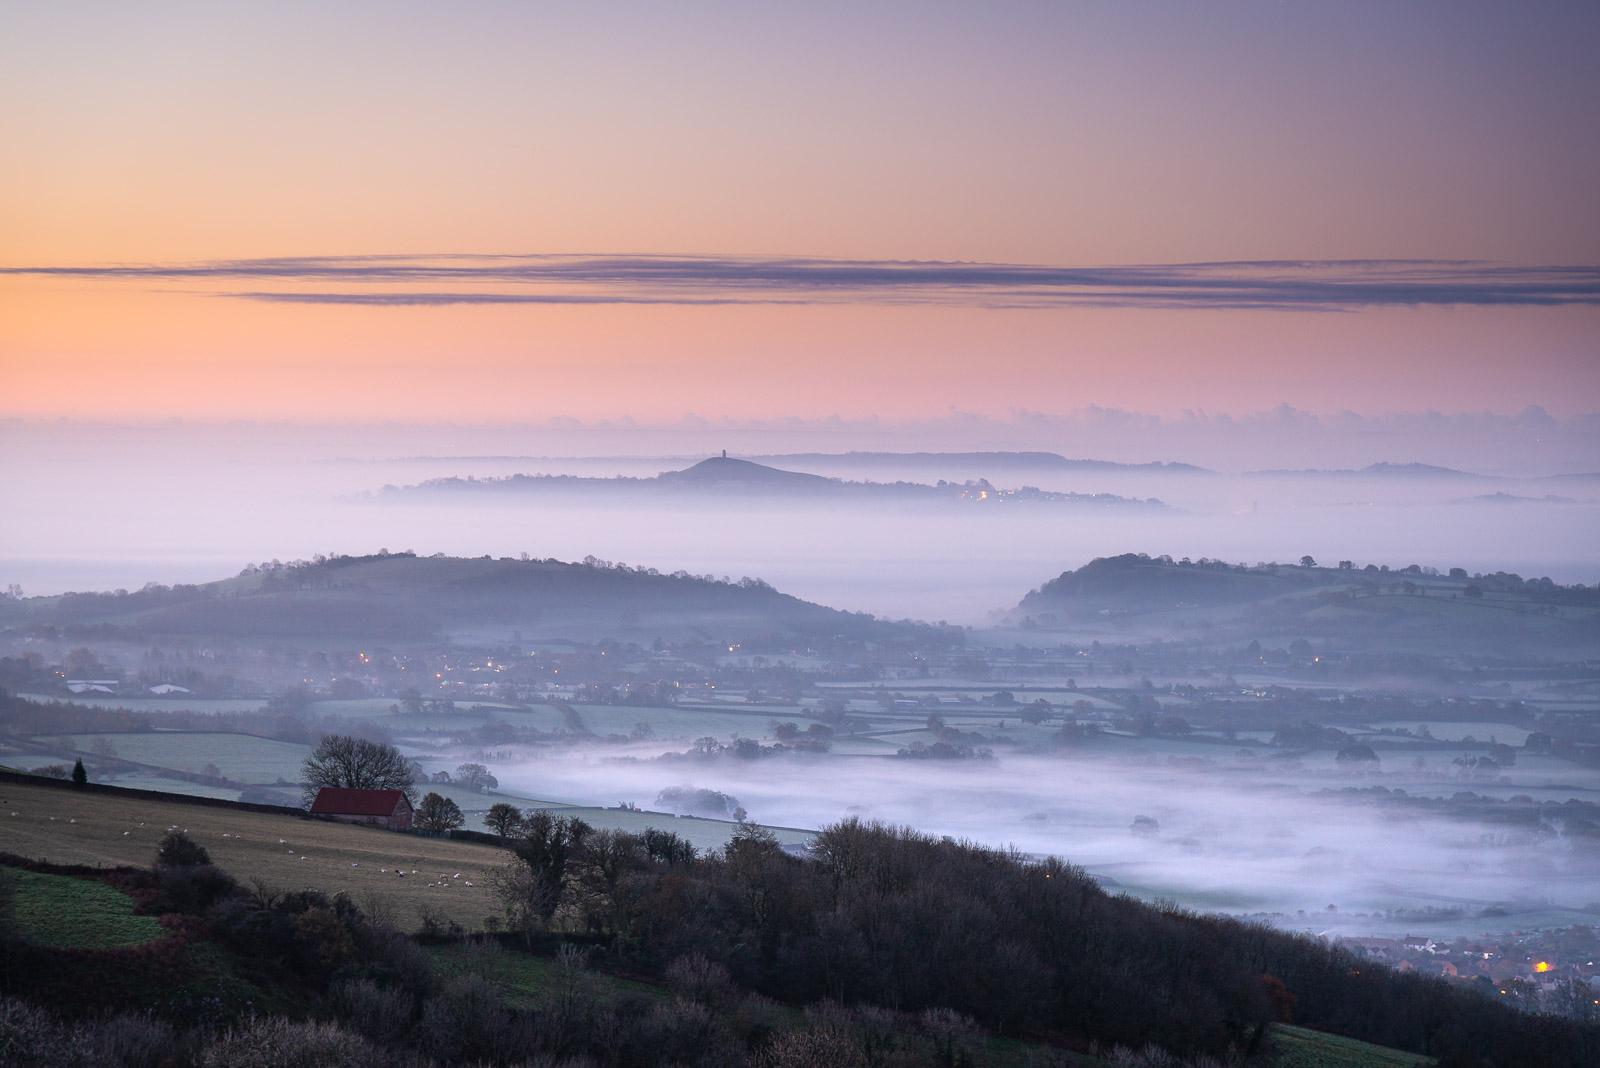 Glastonbury Tor - From Lynchcombe, Mendip Hills, Somerset, UK. ID JB1_8538